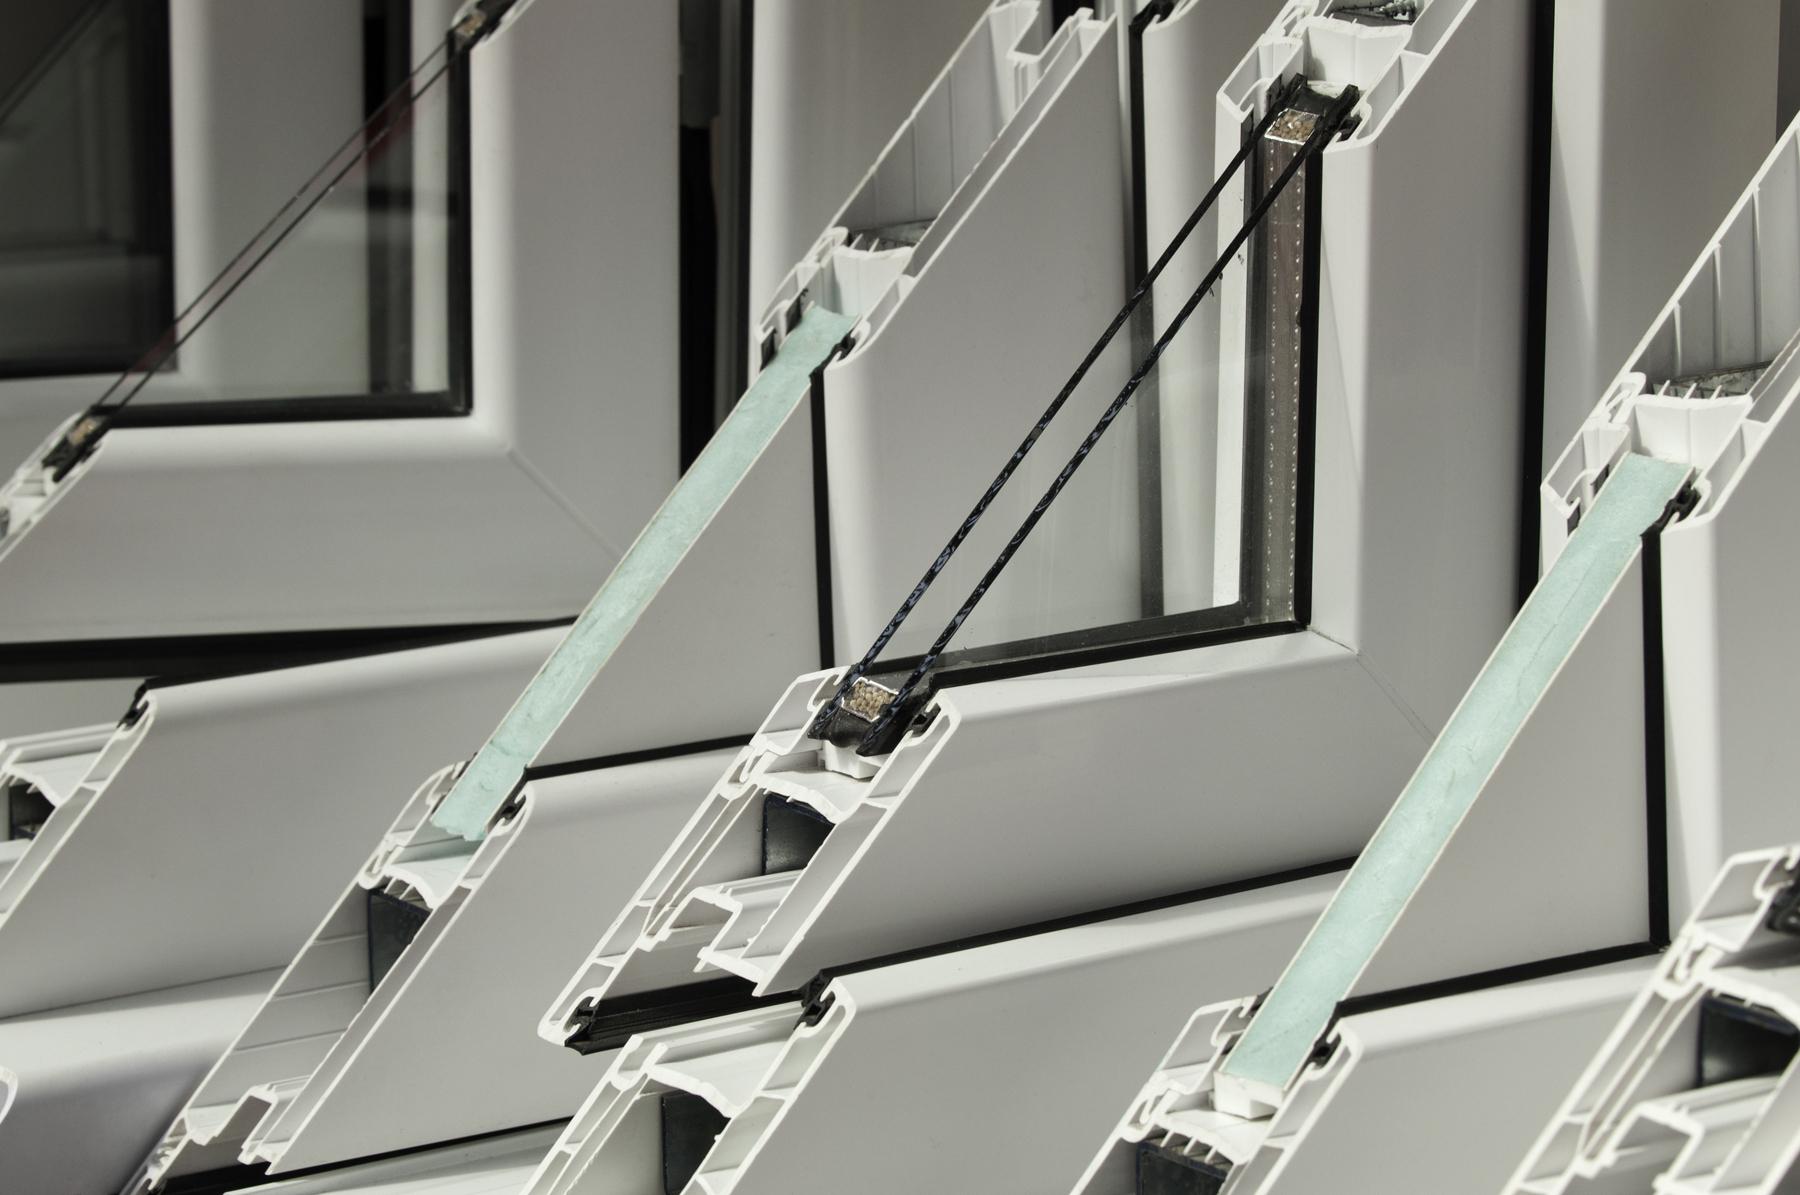 SolarWindow Surpasses Critical Milestone for Manufacturing ...